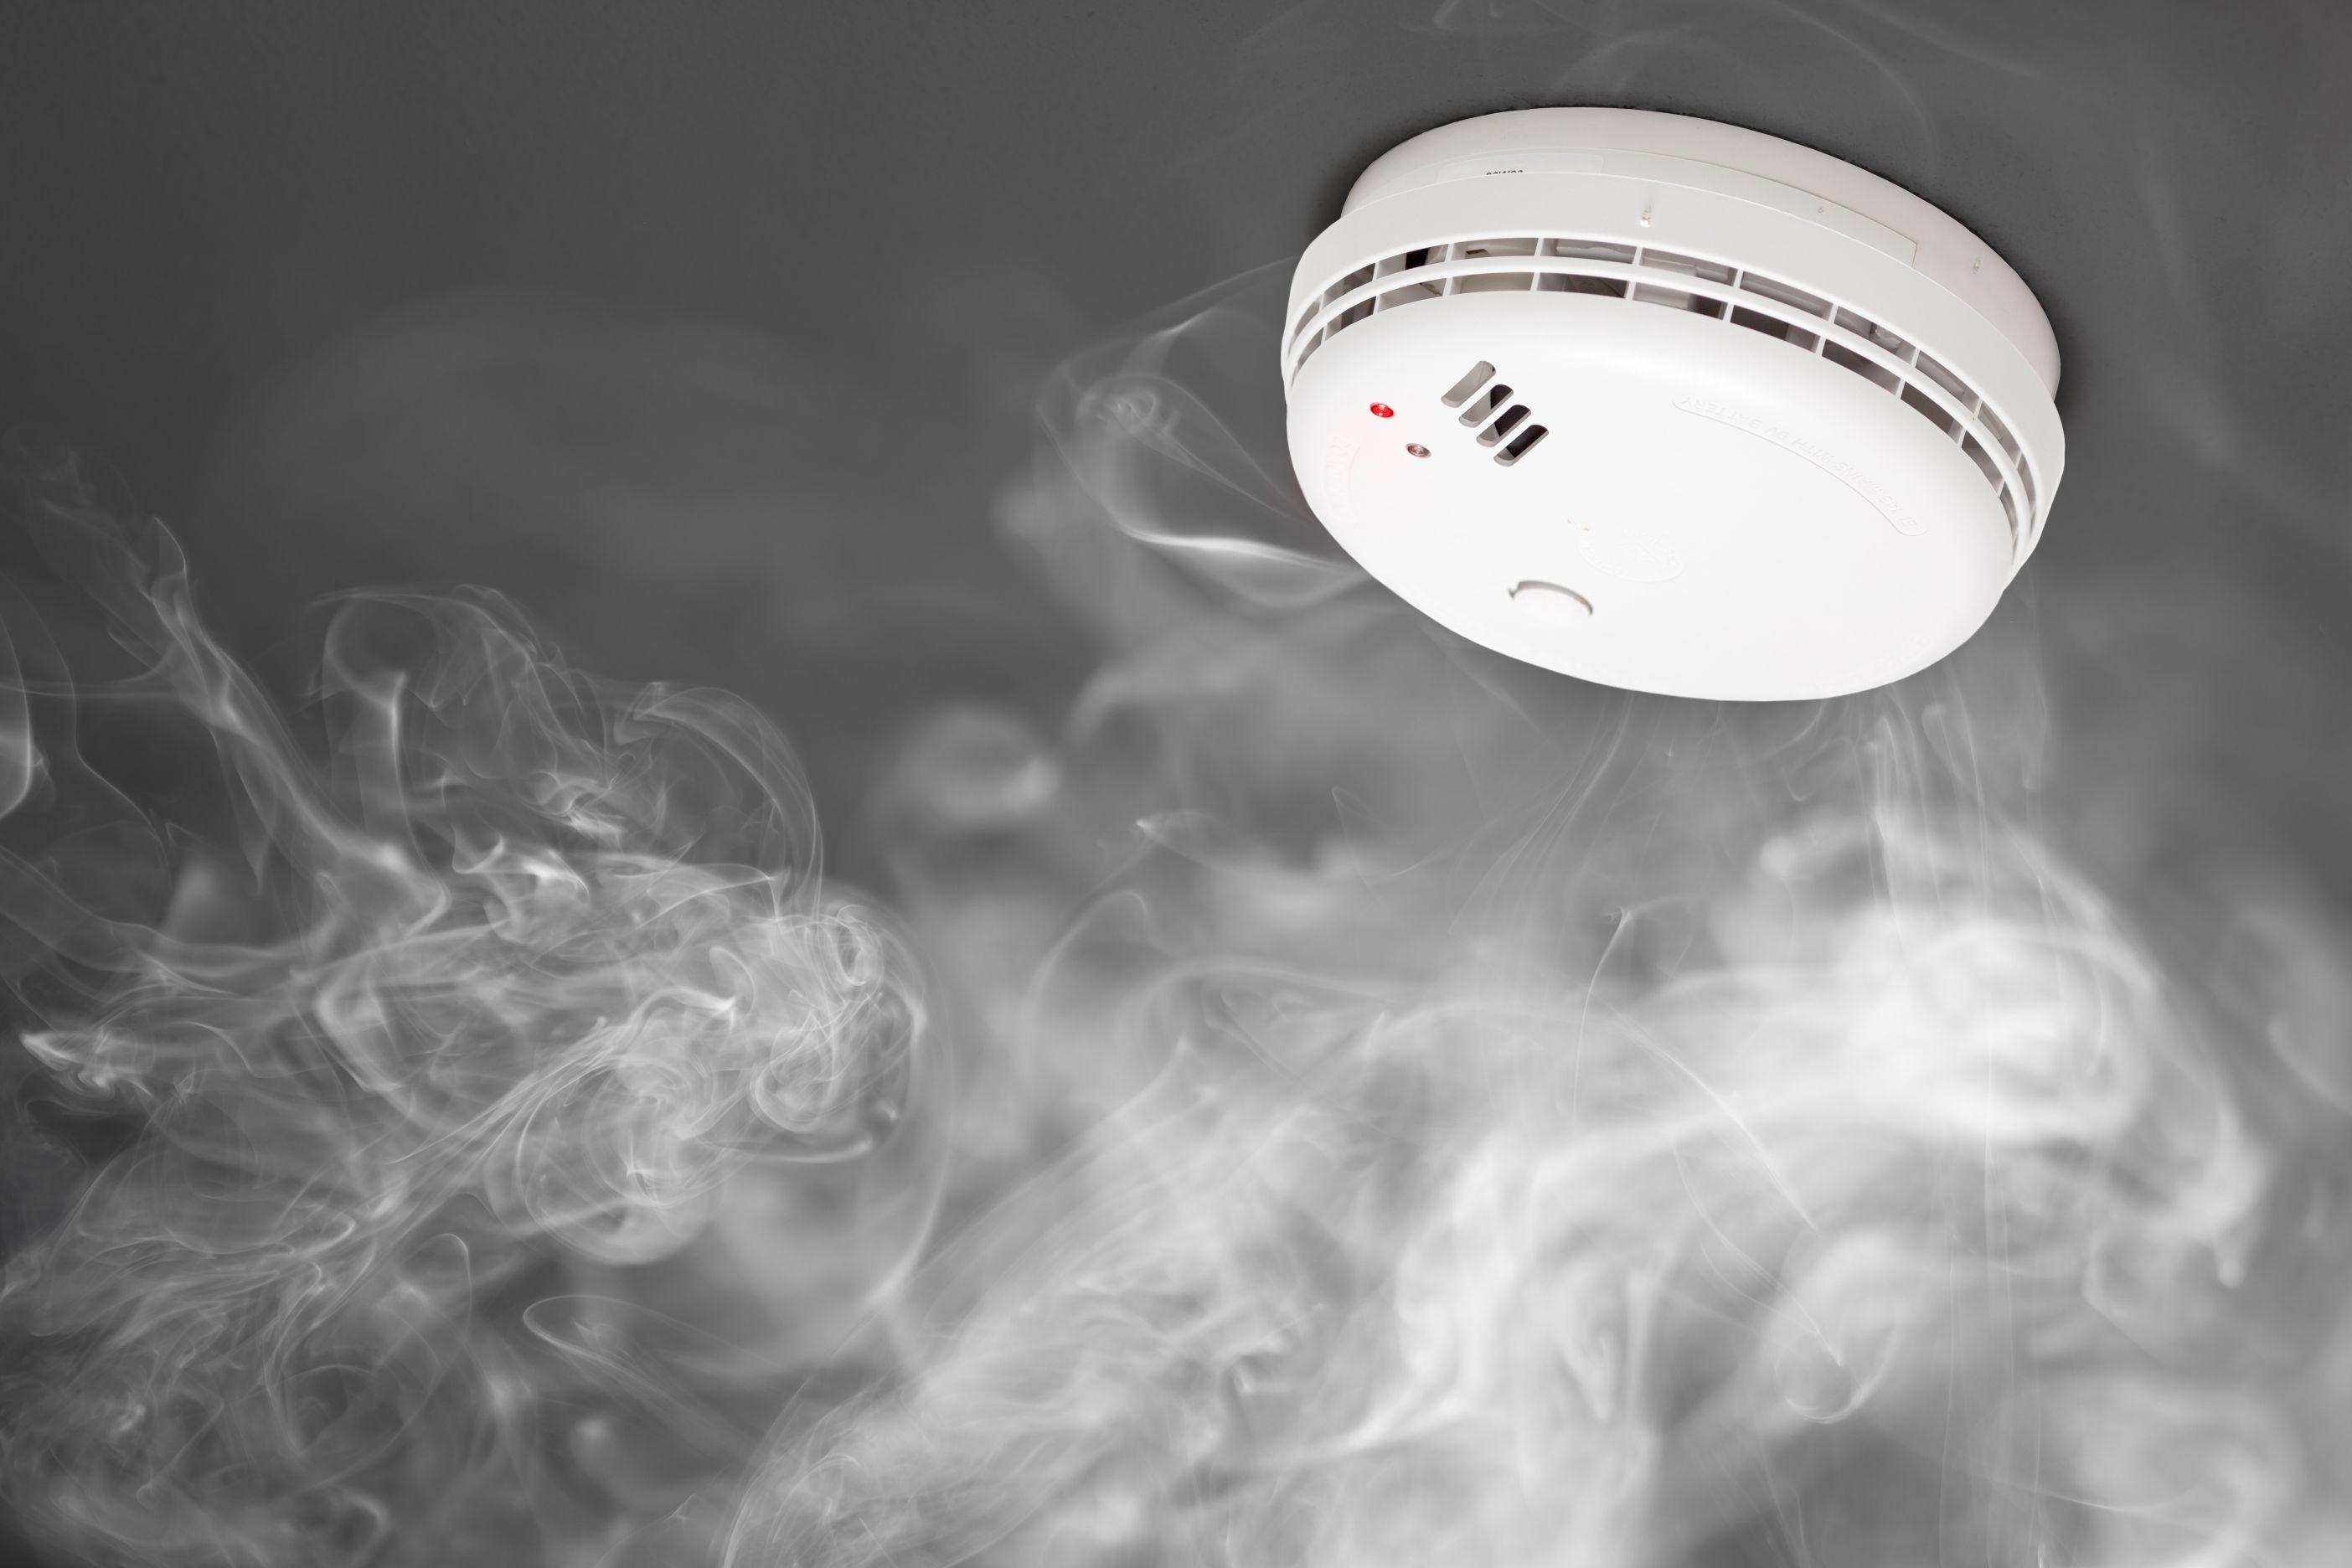 smoke-detectors-alarms